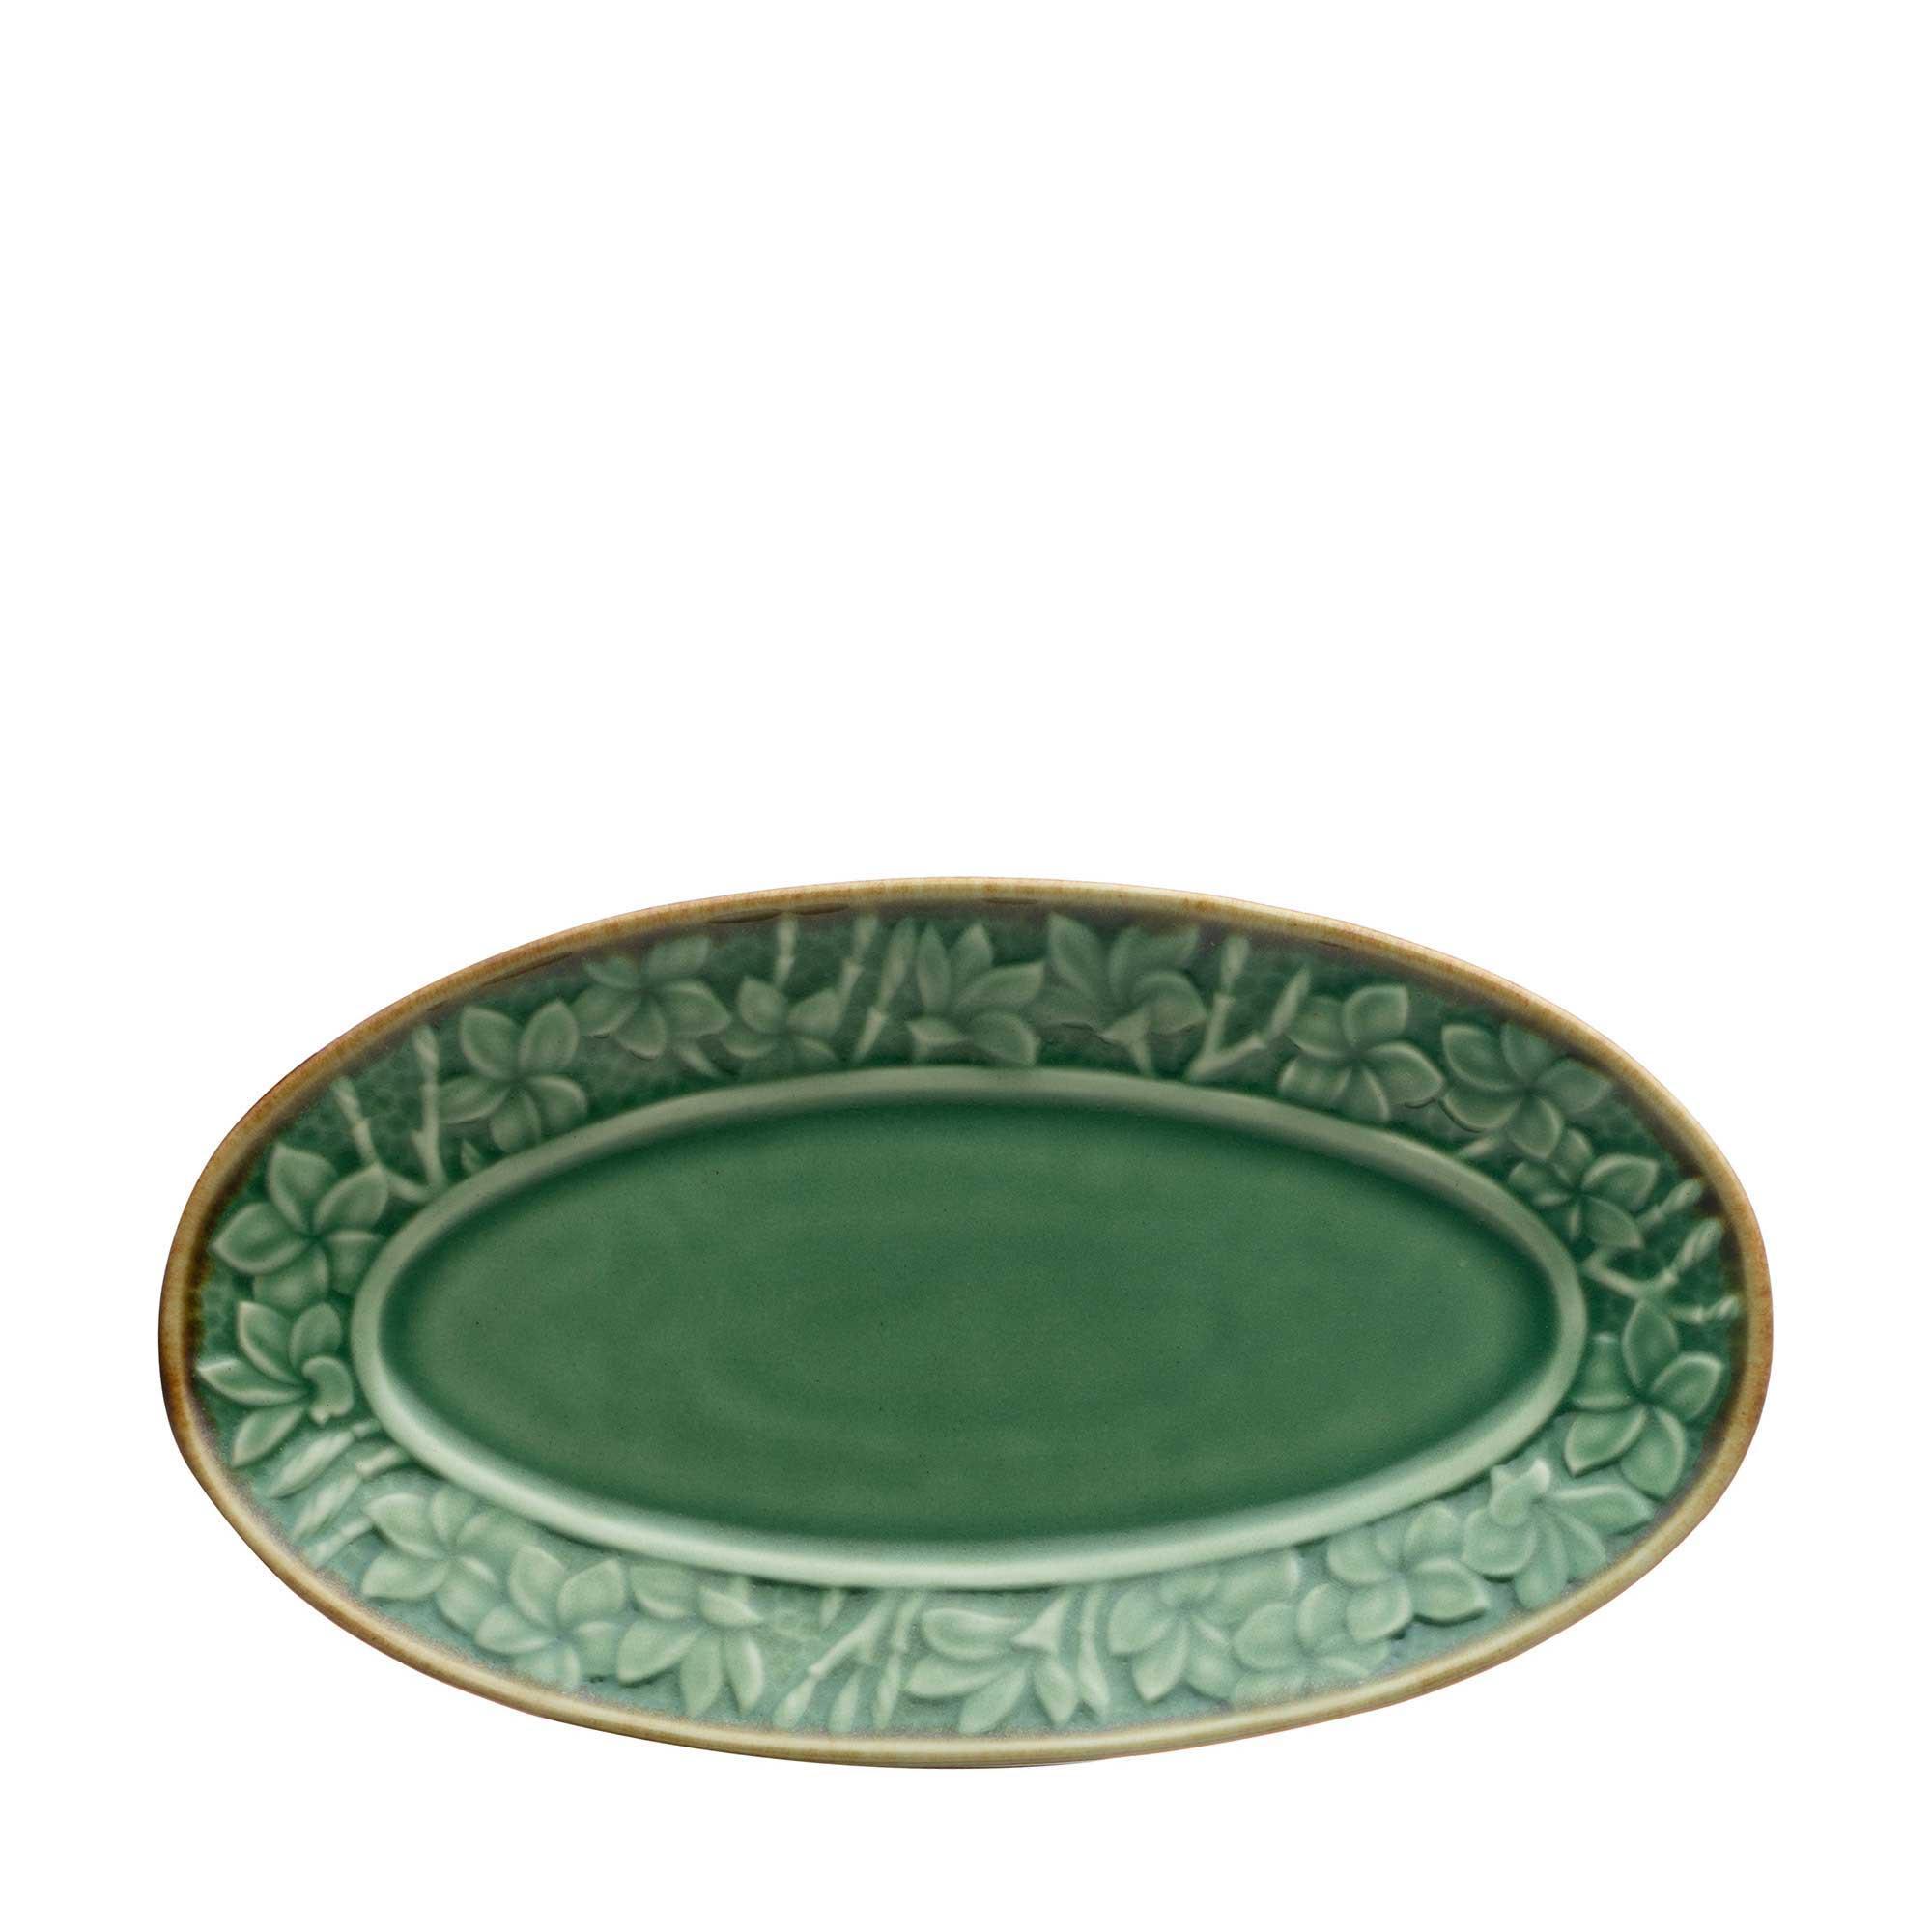 Frangipani Oval Plate set by Lukas